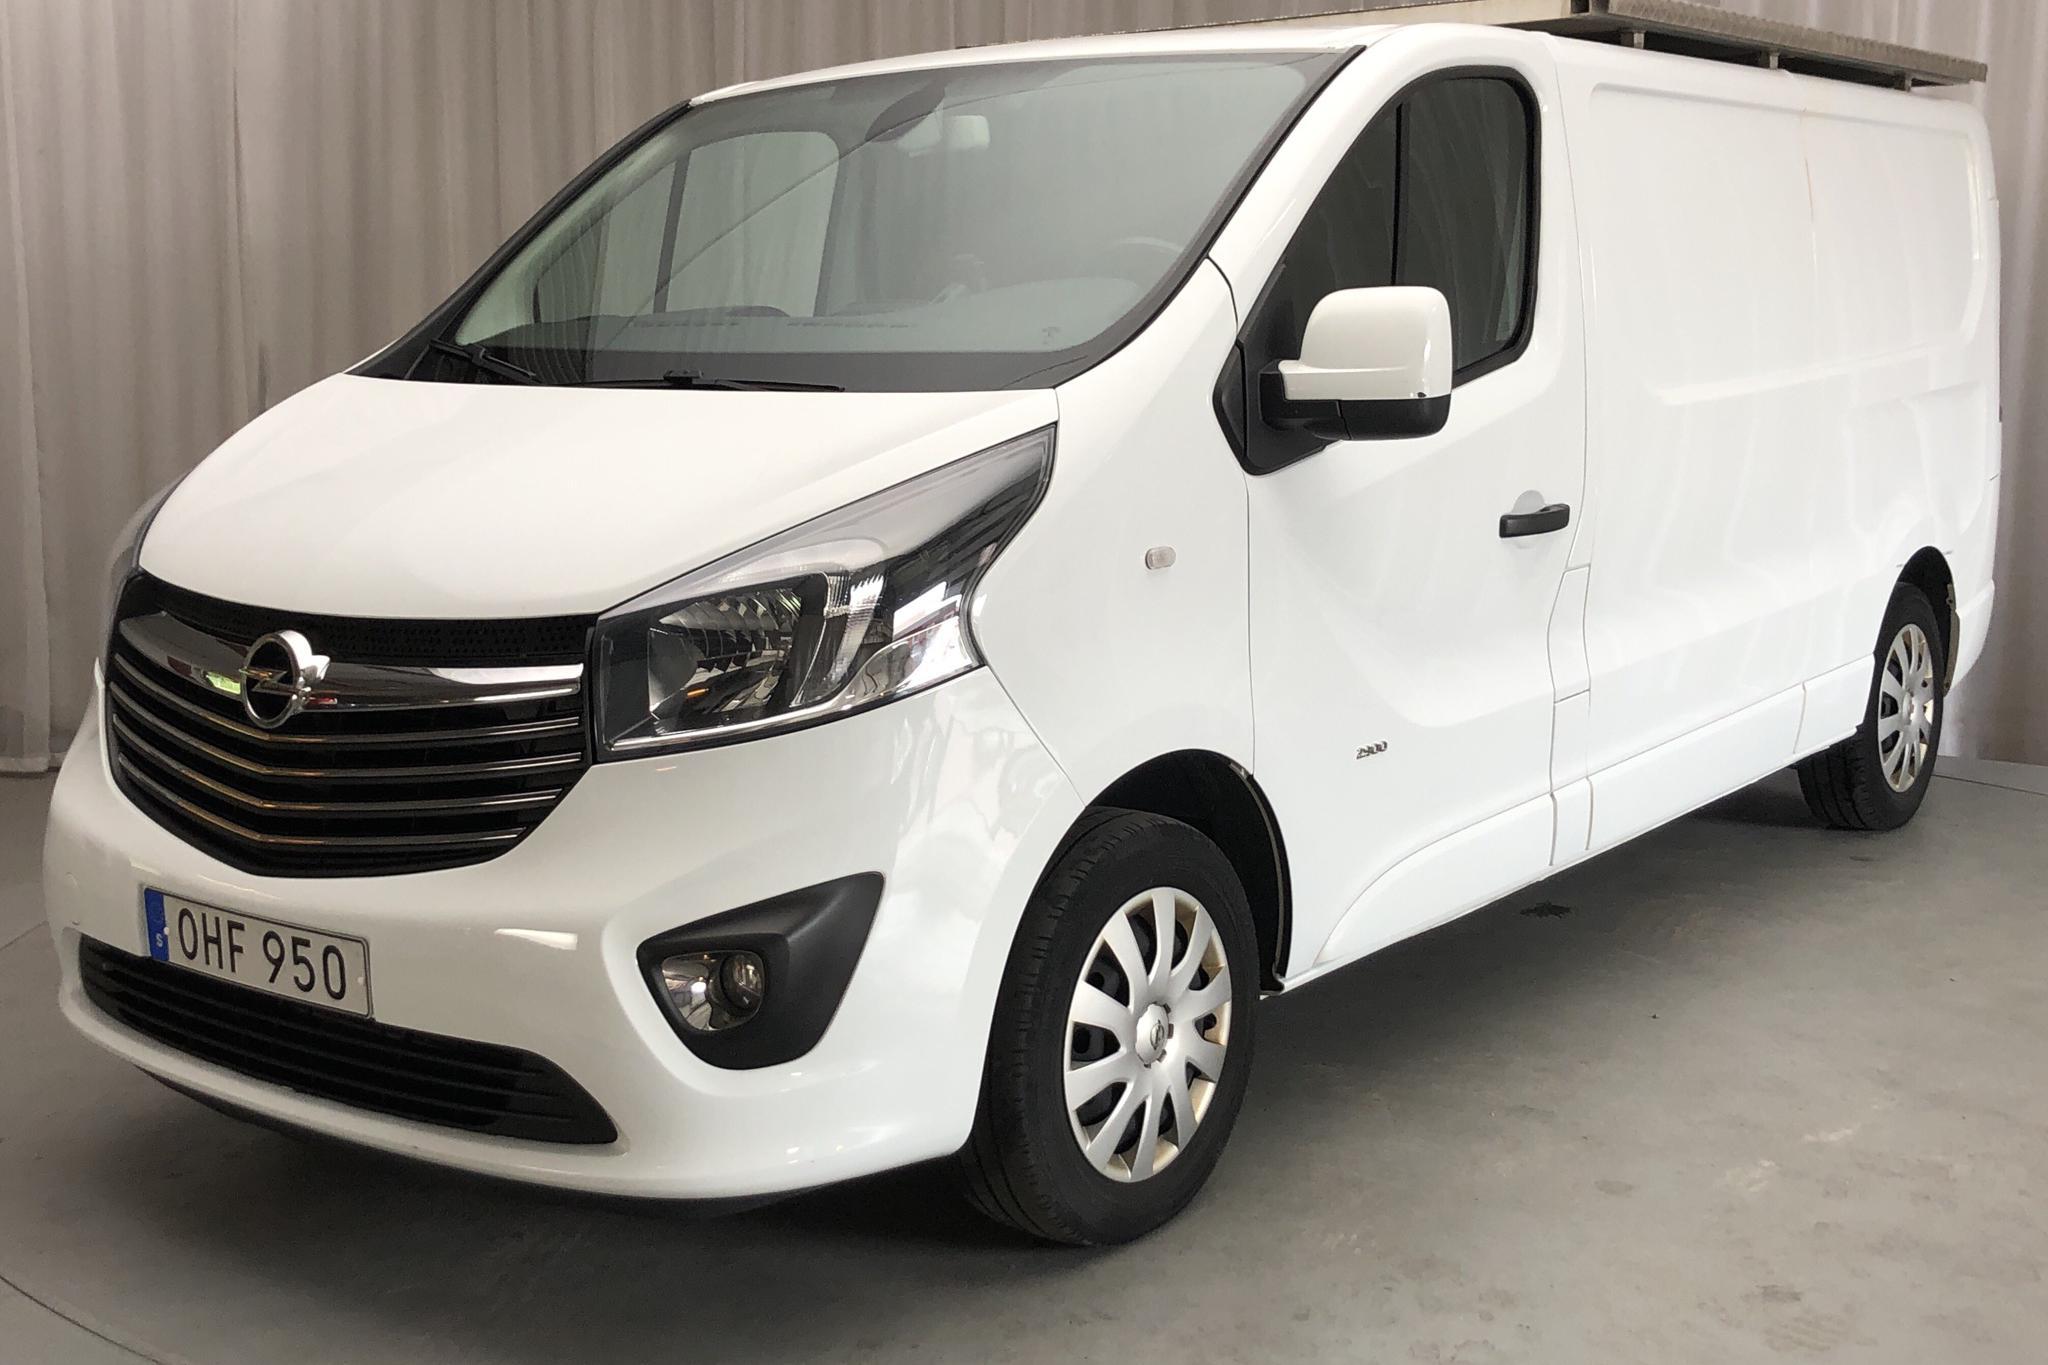 Opel Vivaro 1.6 BITURBO (125hk) - 124 140 km - Manual - white - 2017